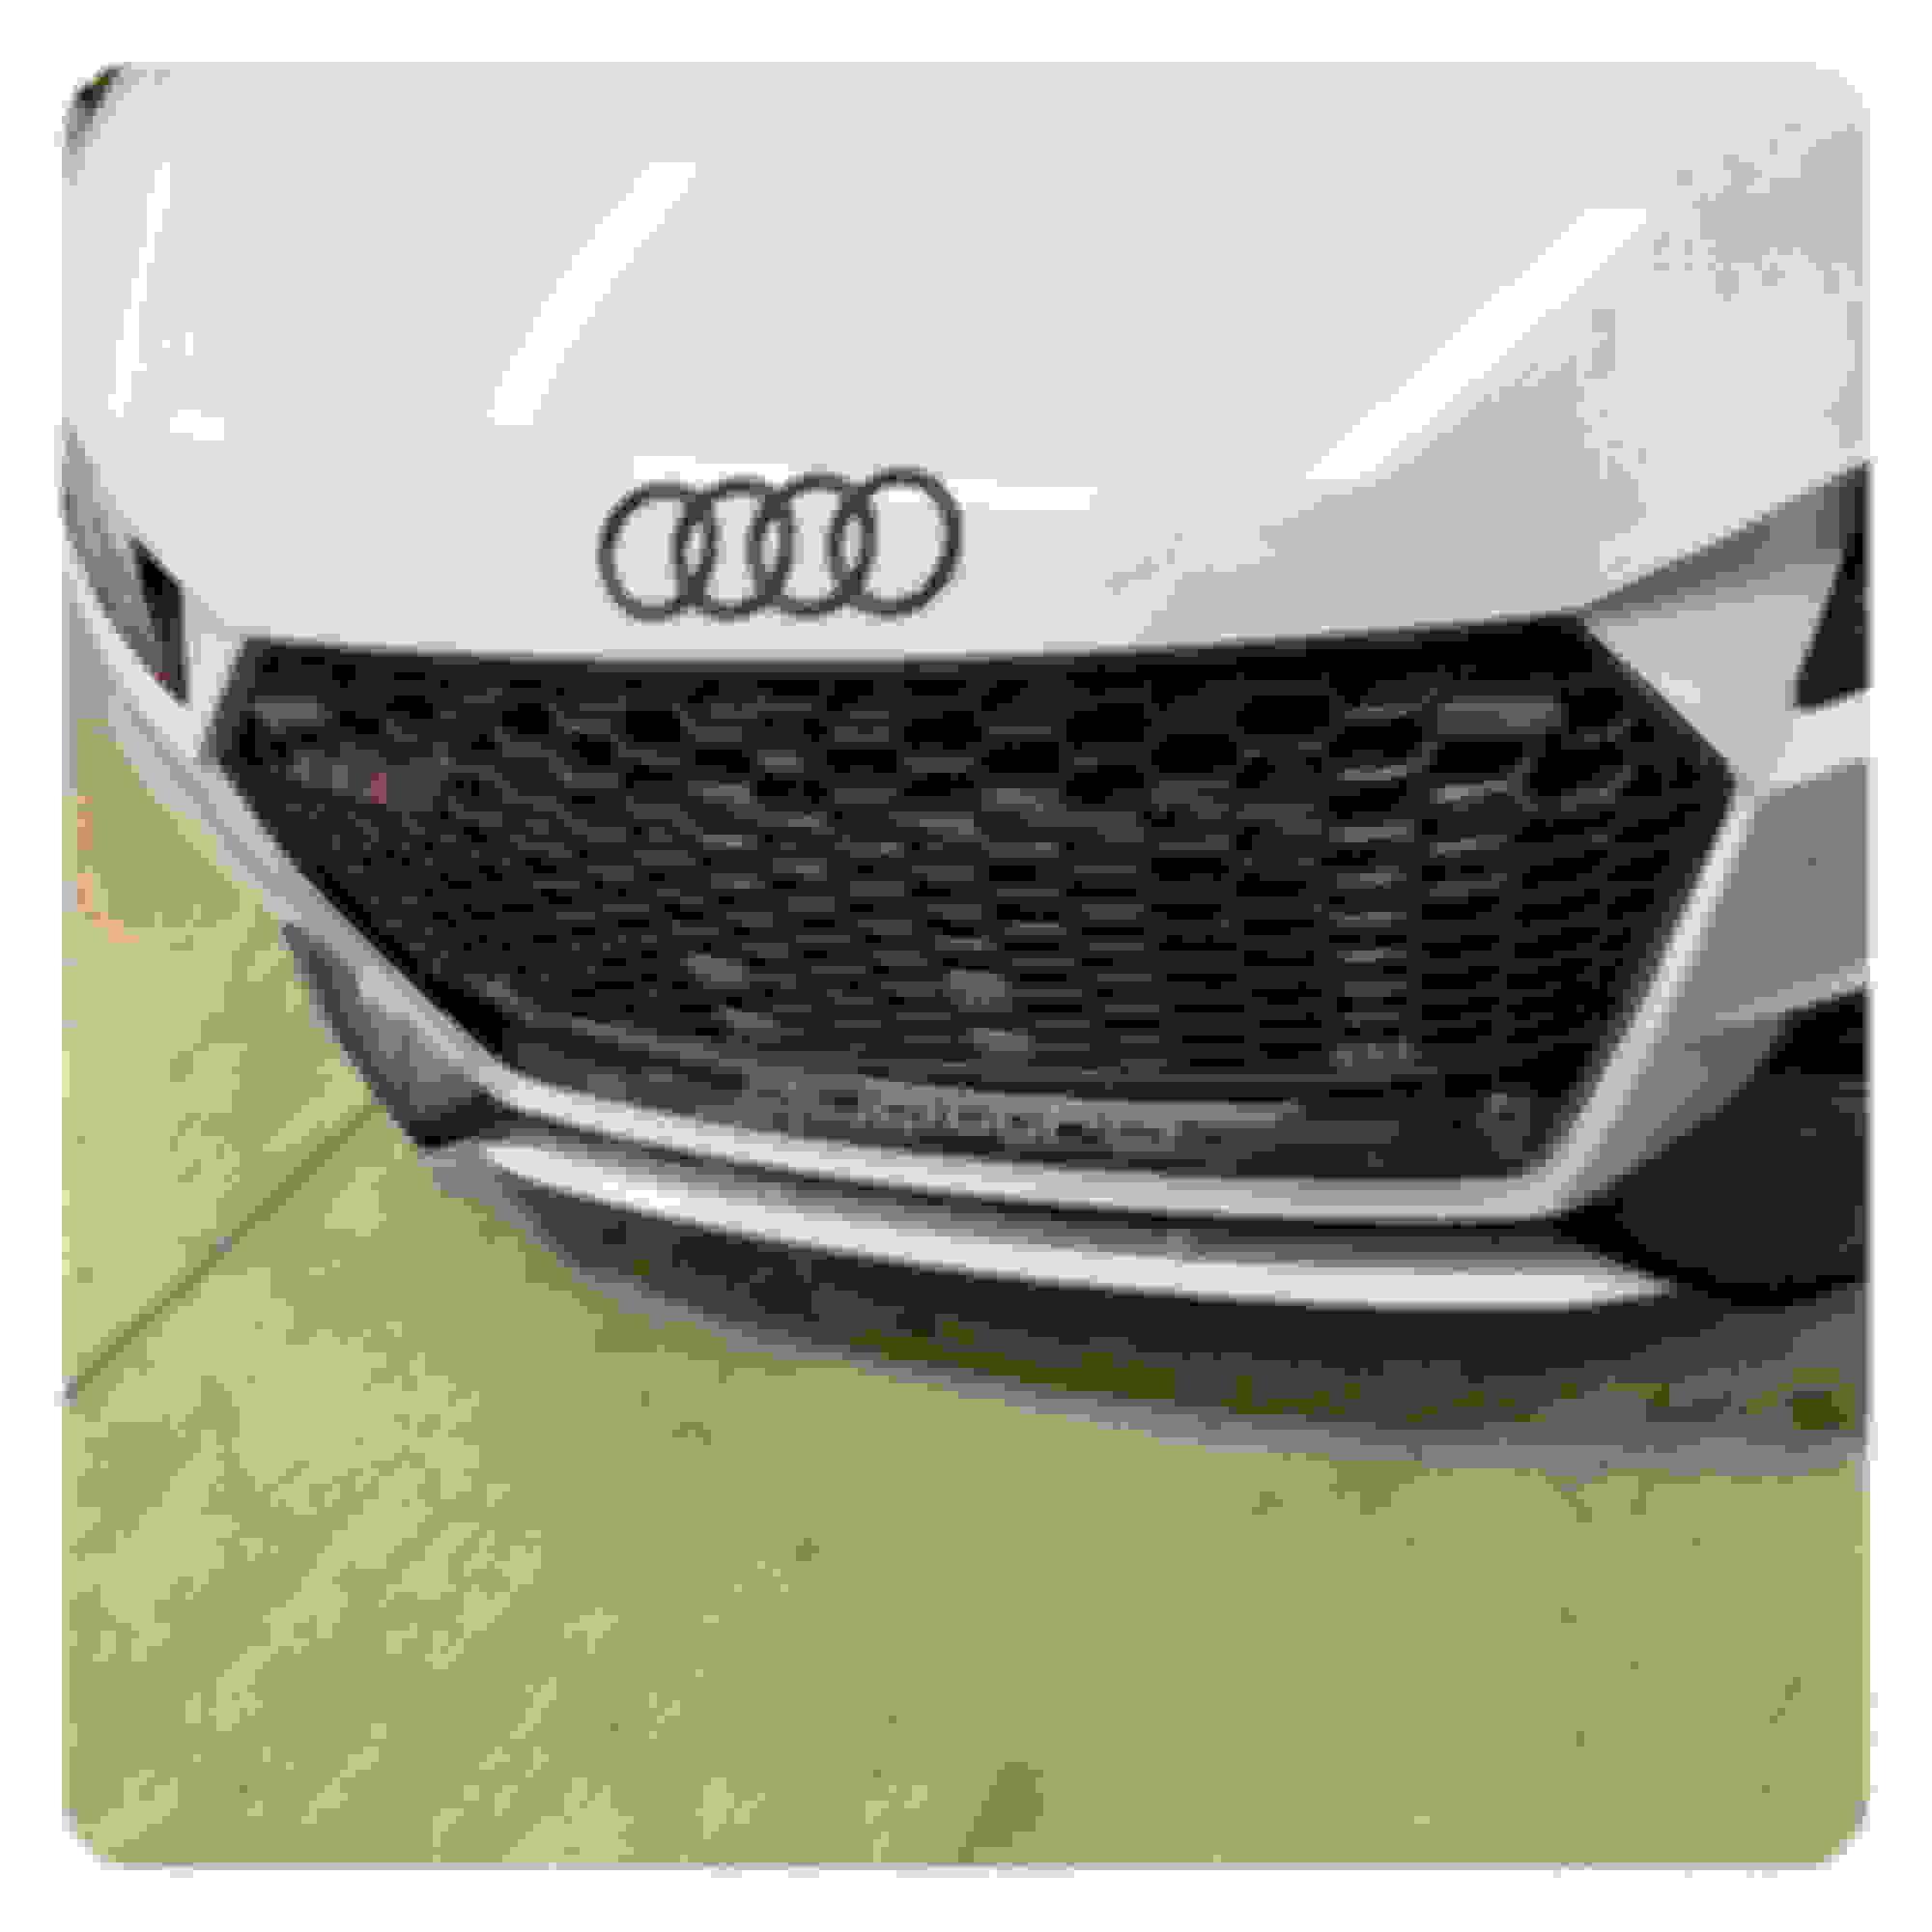 JB4 Piggyback tuning on an B9 S5 - AudiWorld Forums